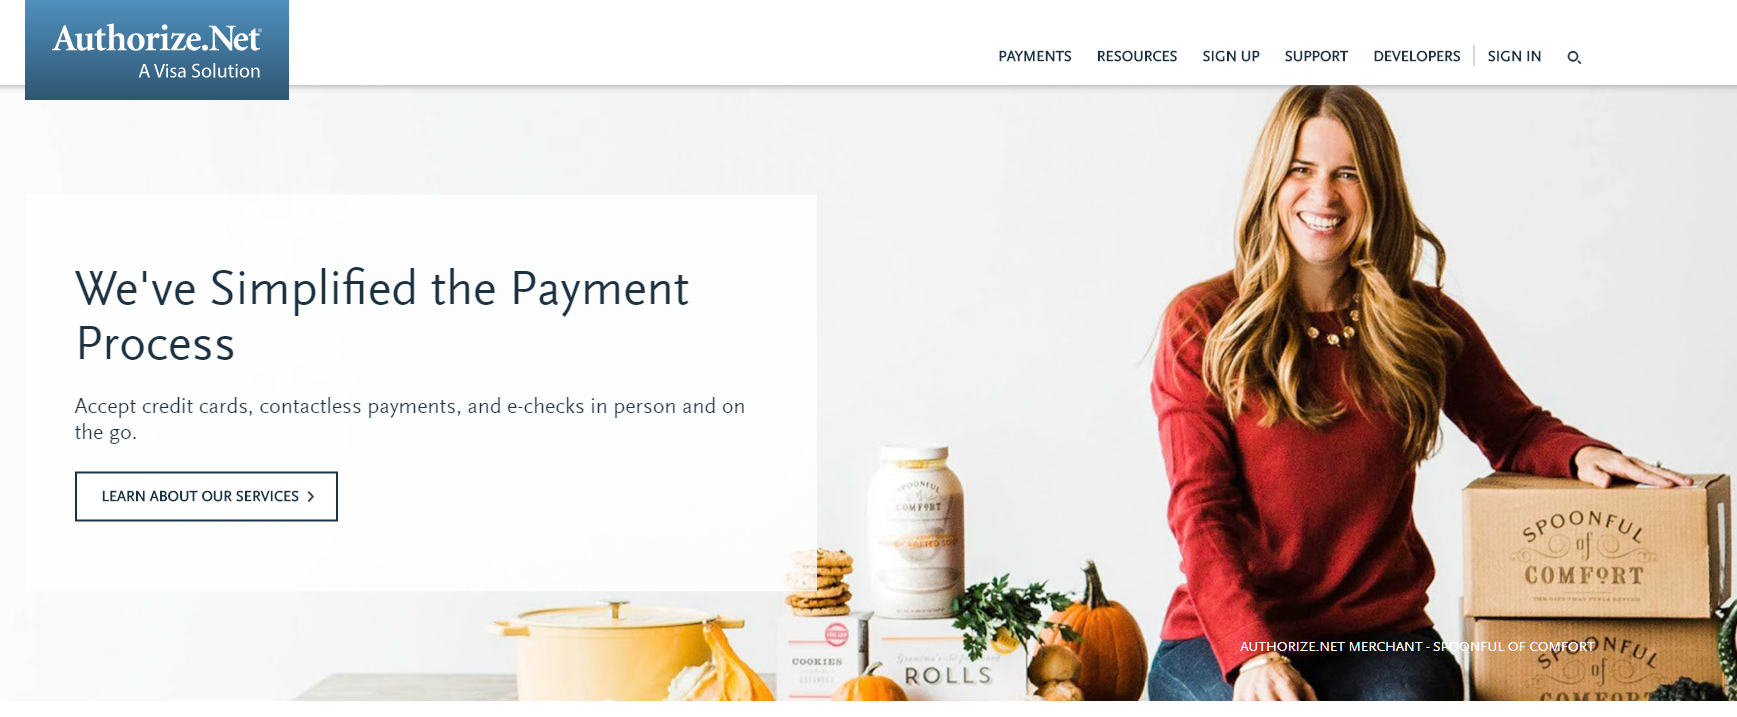 authorize.net payment gateway